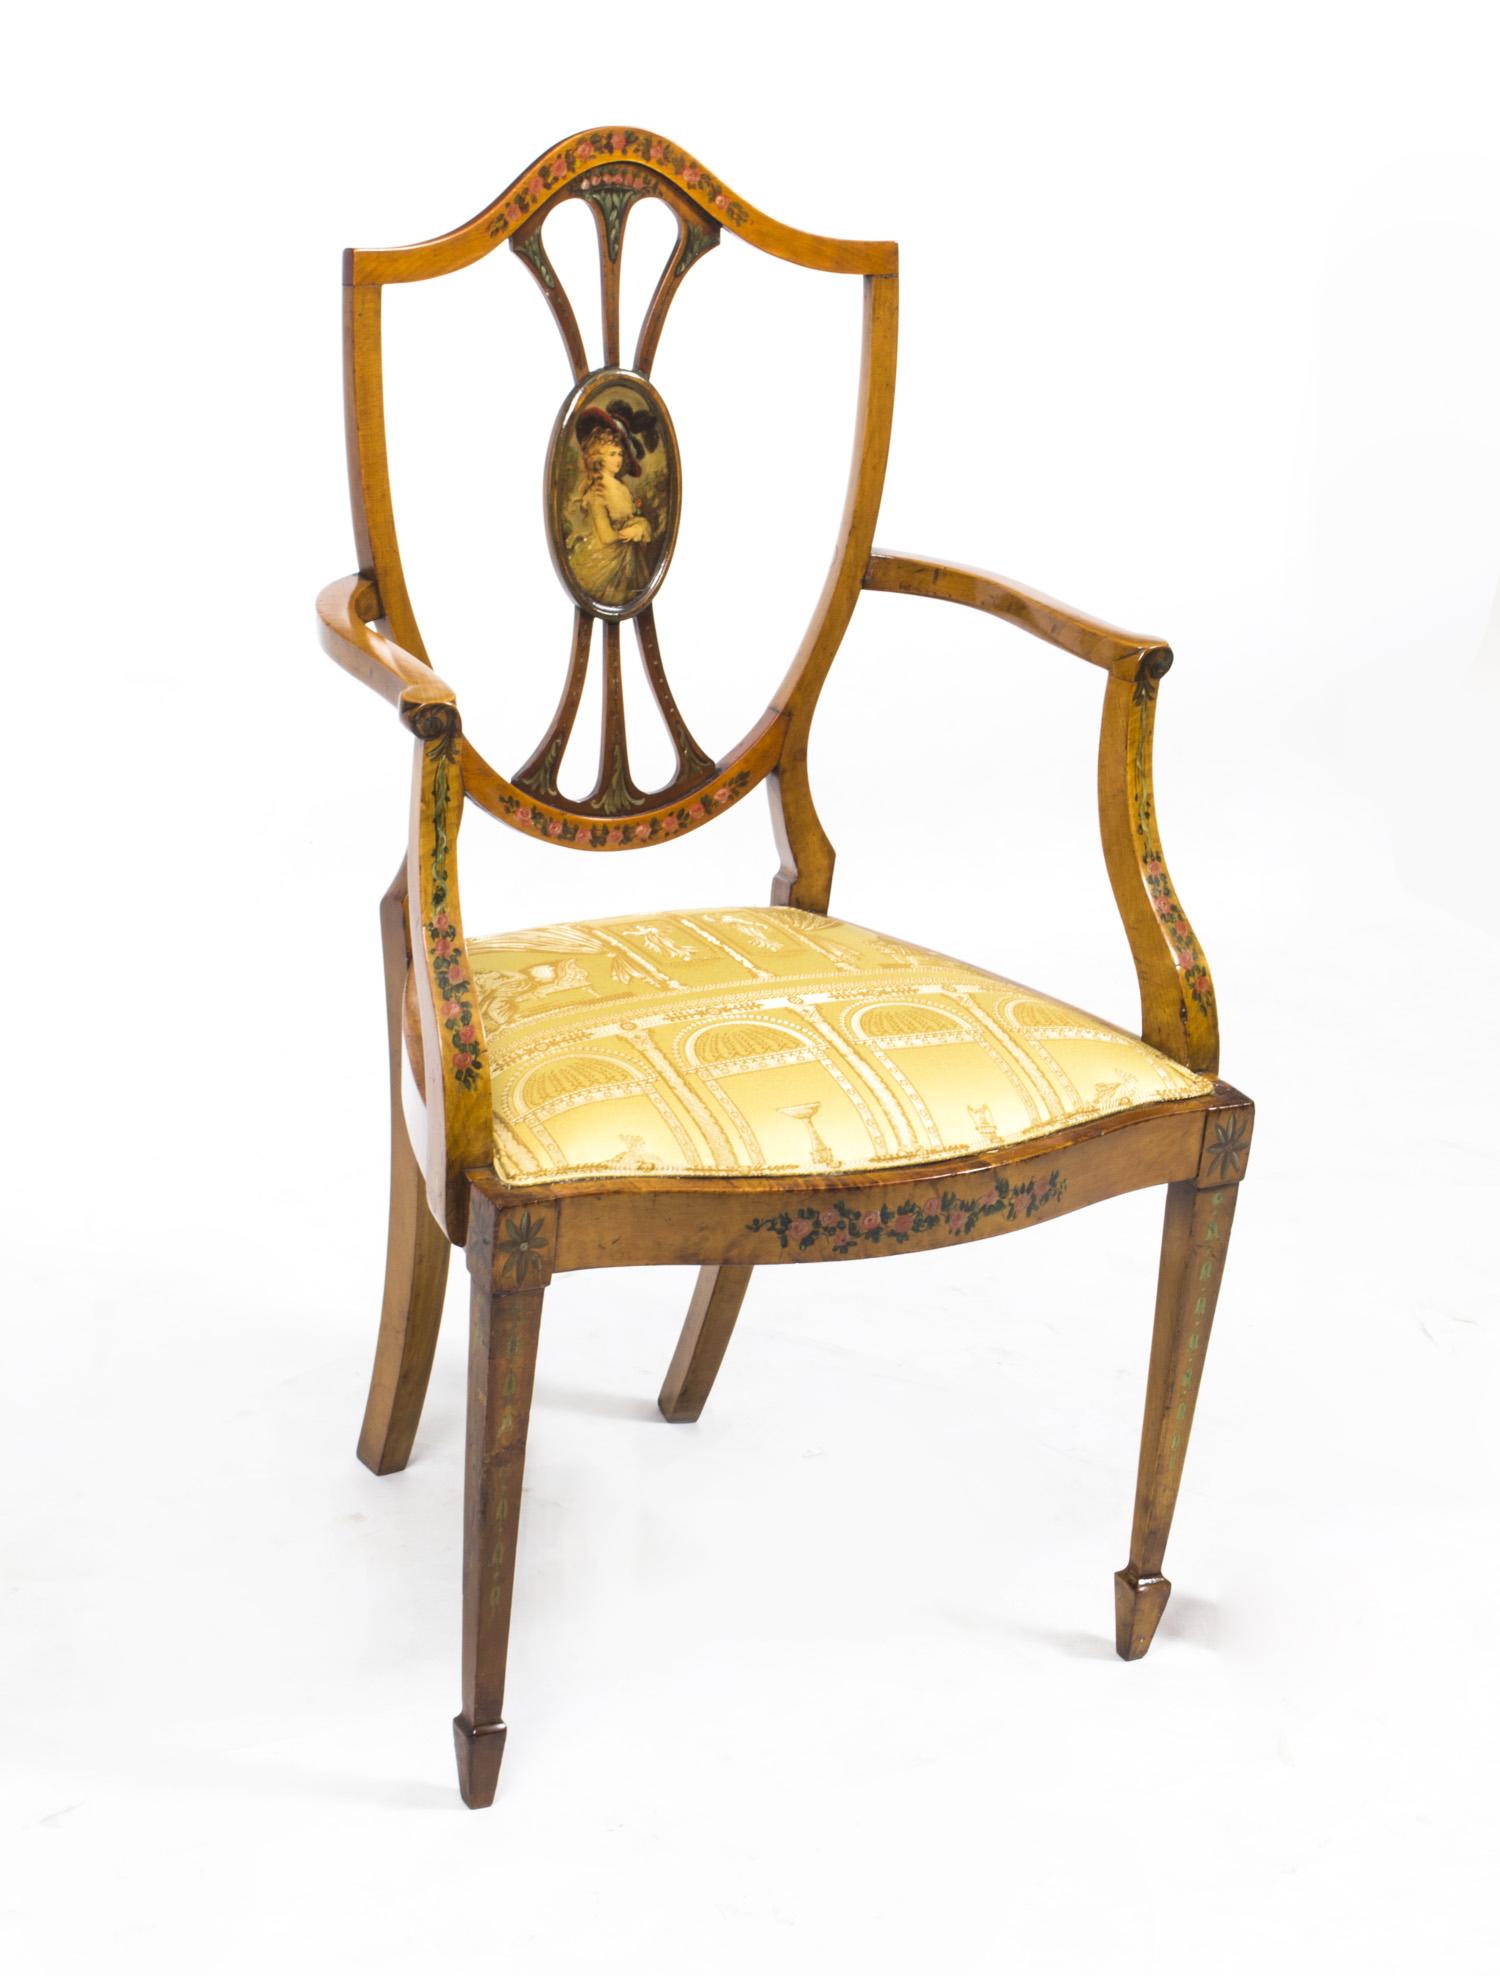 Thomas sheraton chair - Thomas Sheraton Chair 19